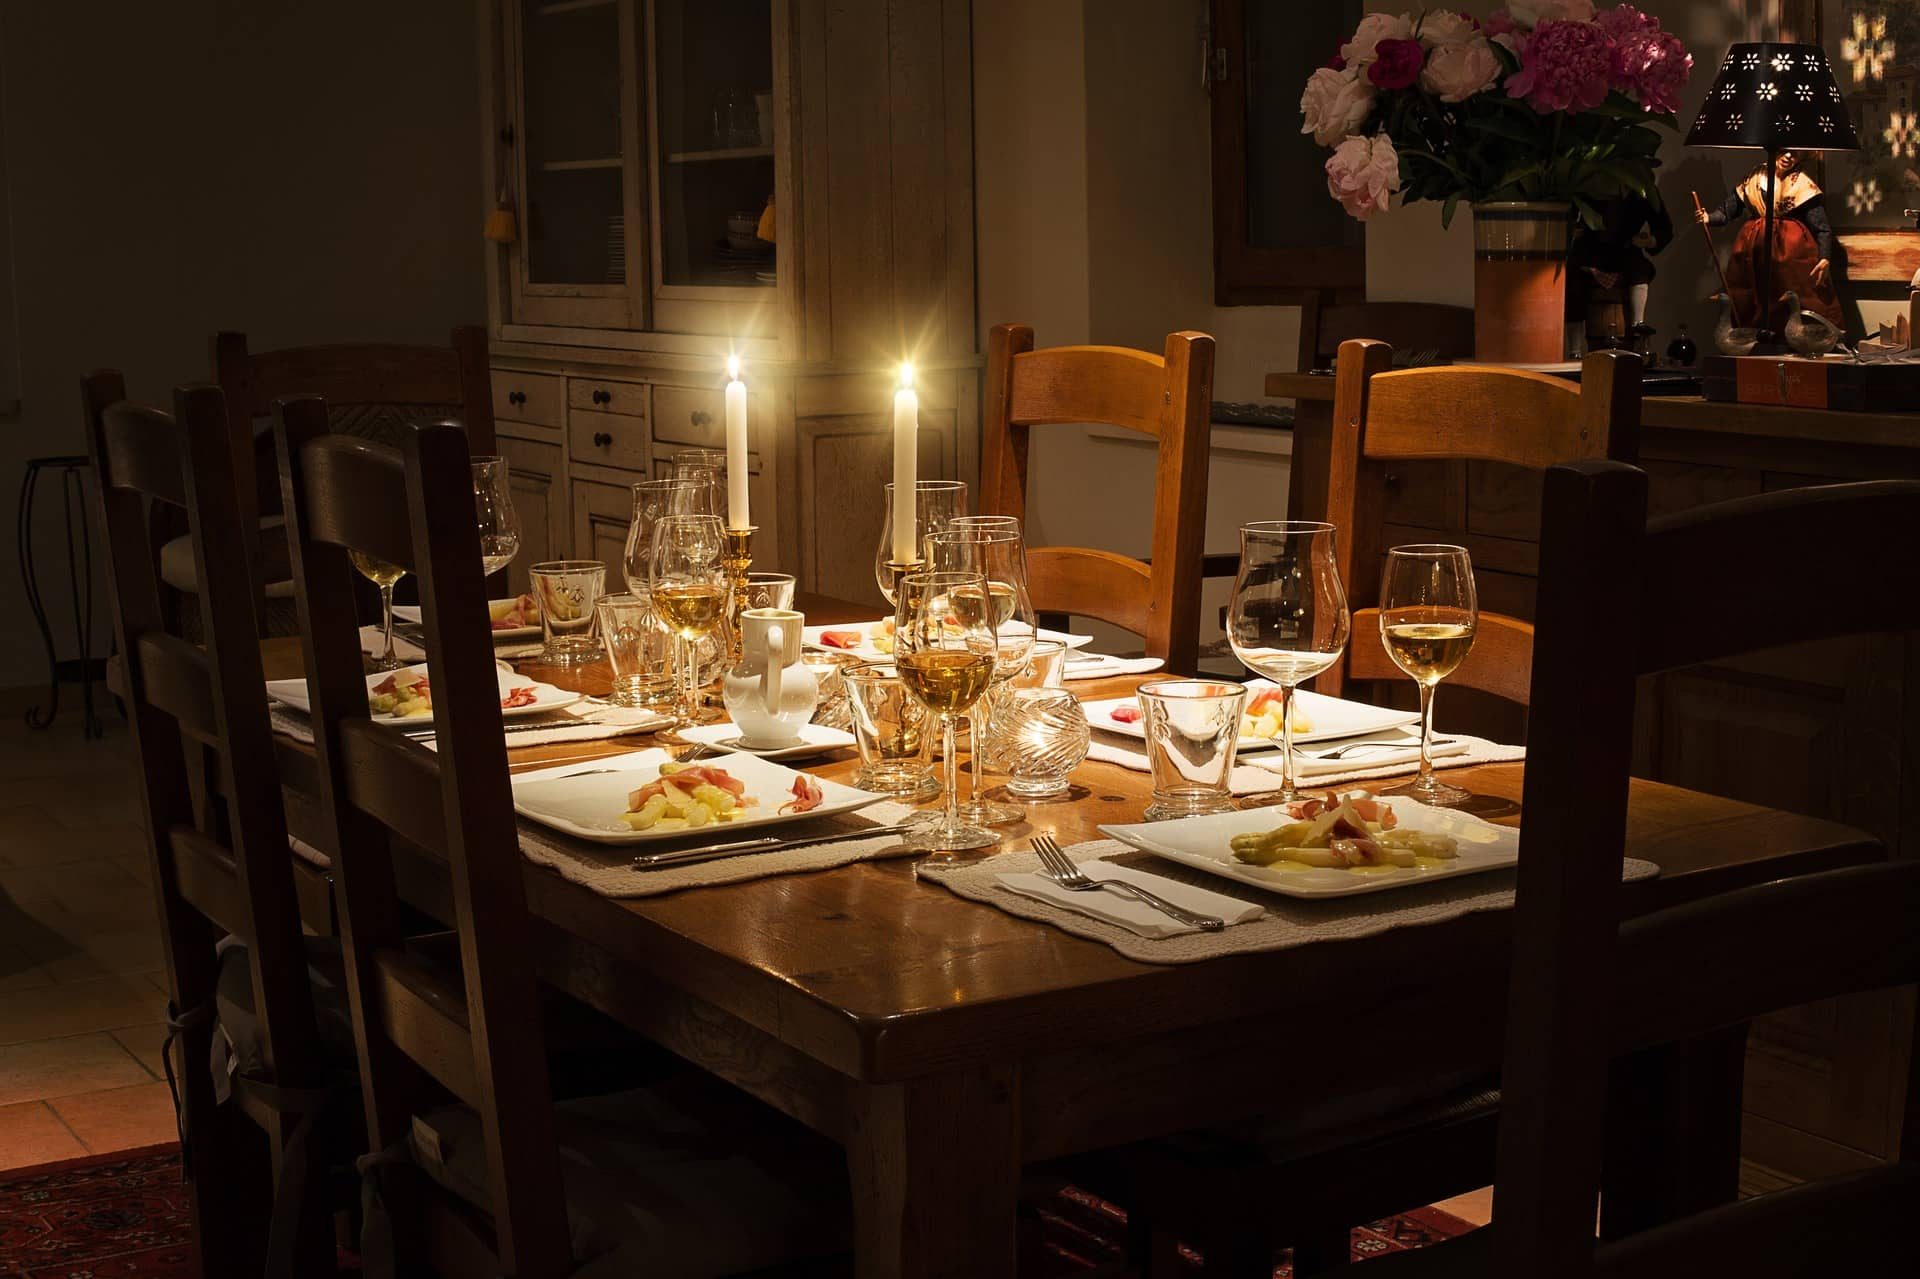 Friday Night Dinner at home